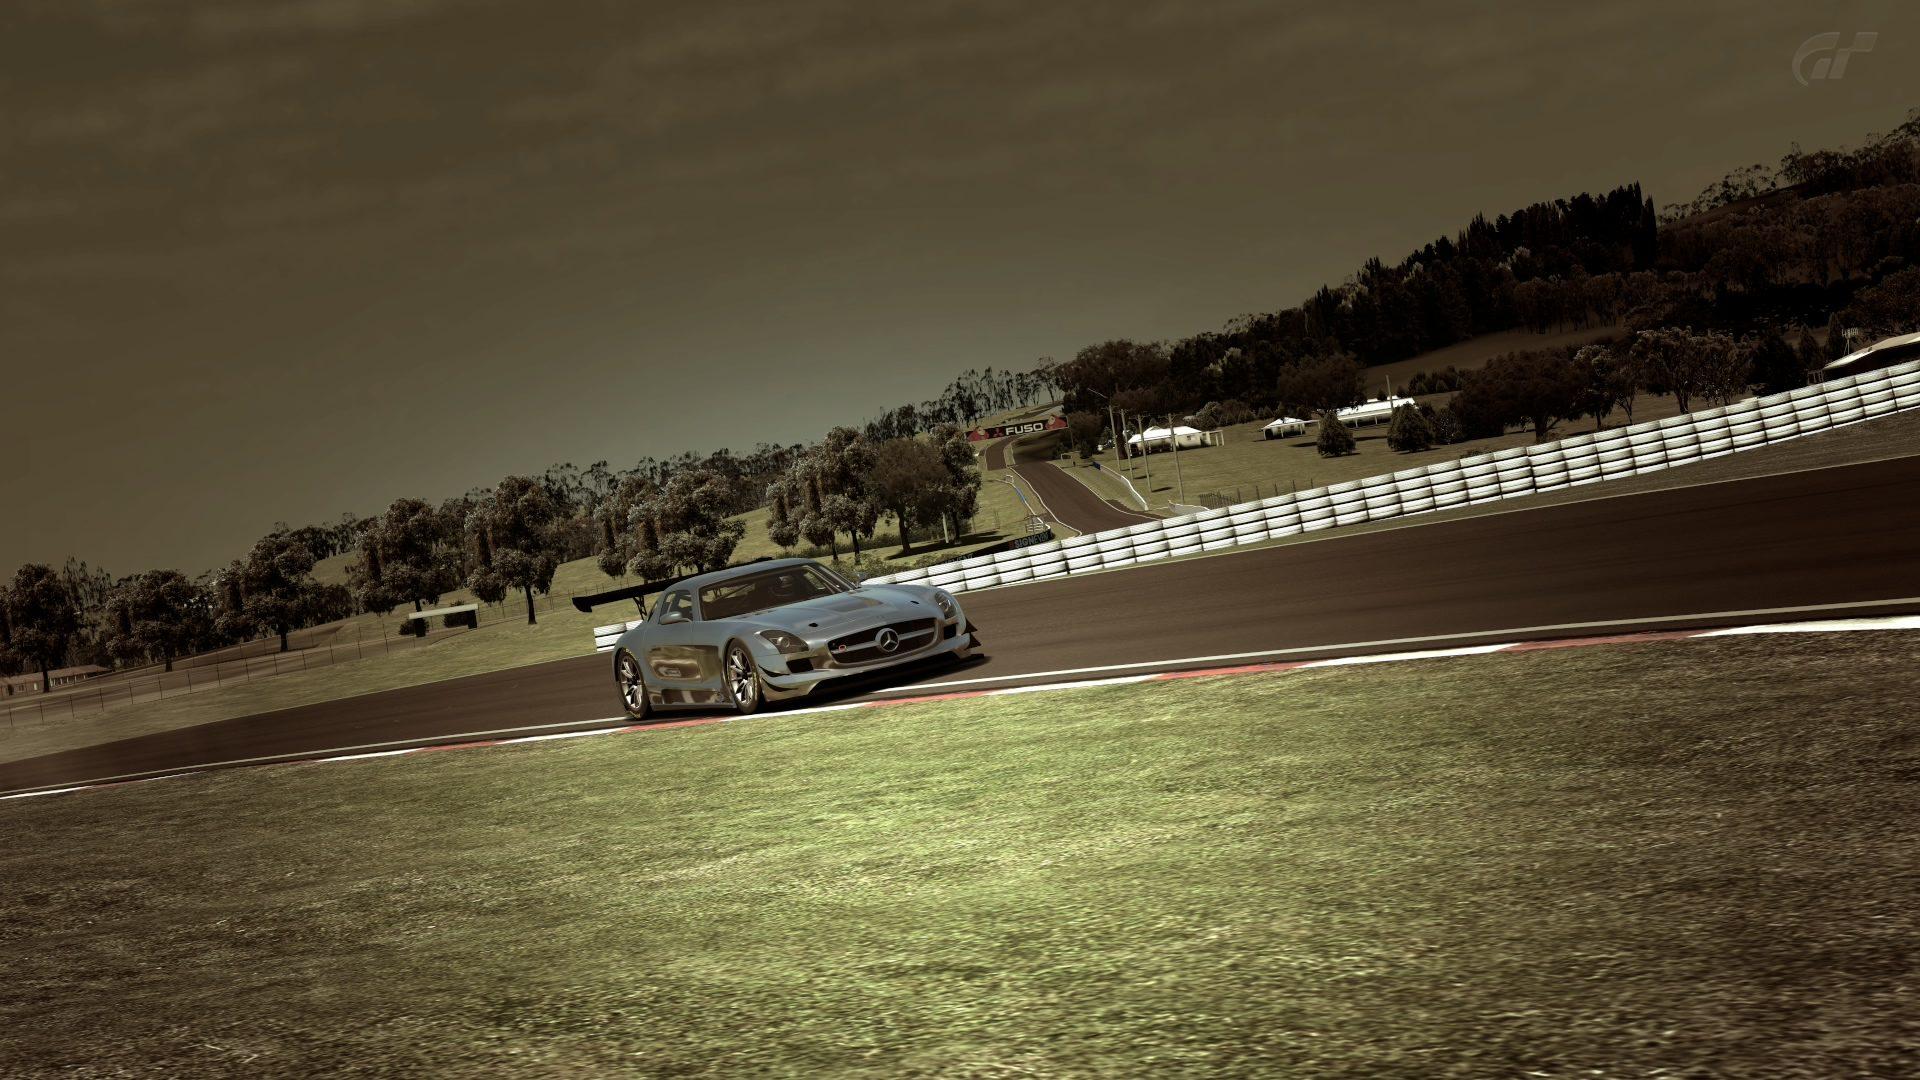 Mount Panorama Motor Racing Circuit_6 (2).jpg